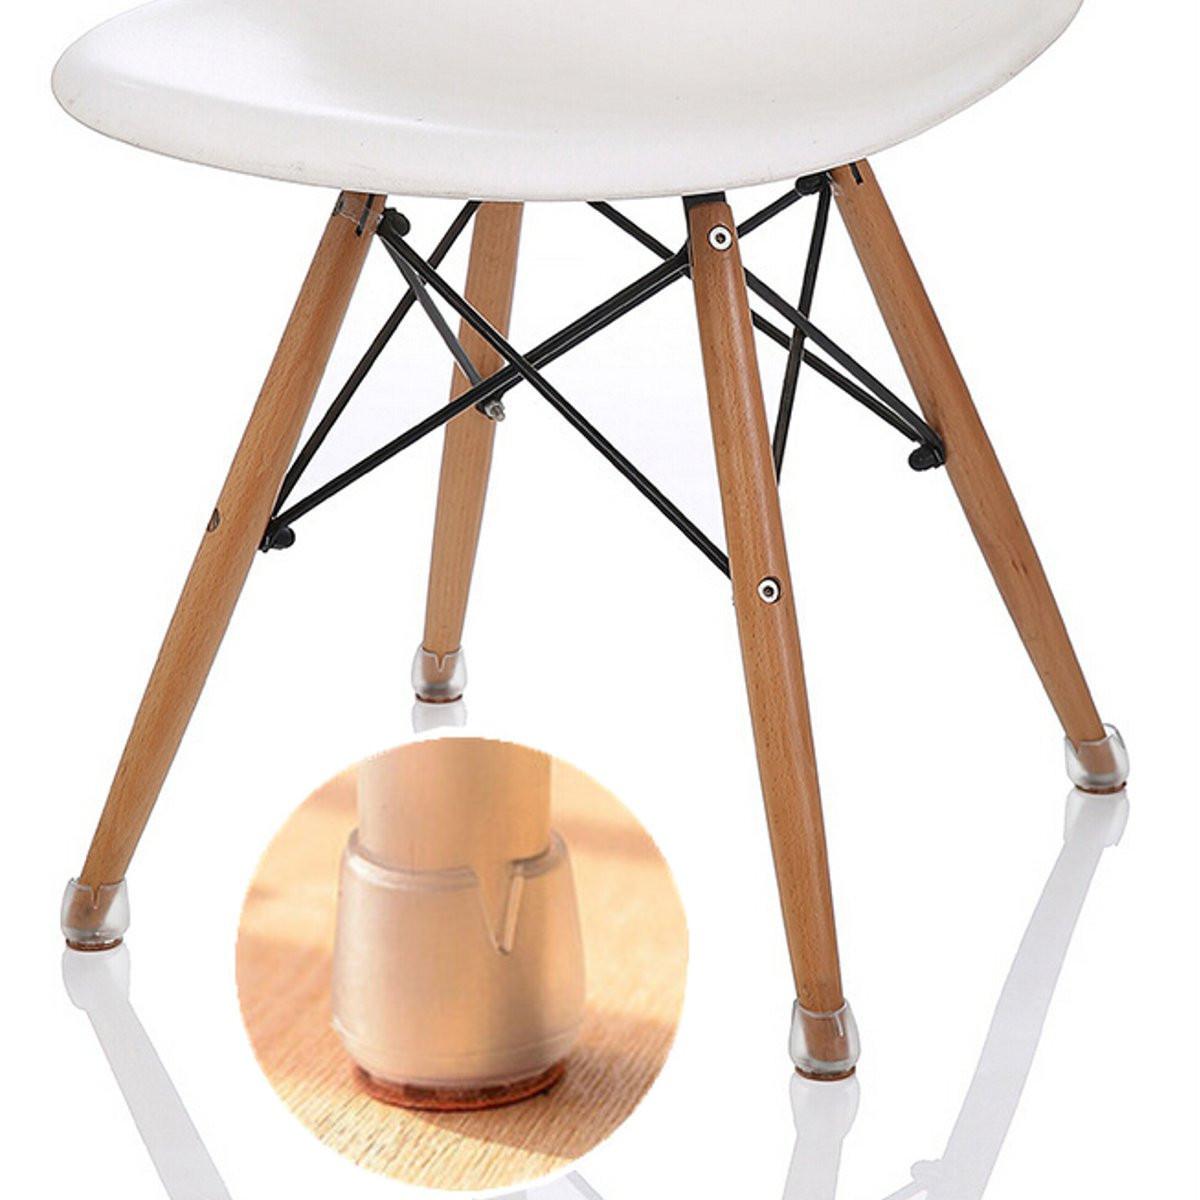 chair bottom pads cedar adirondack round leg caps rubber feet protector